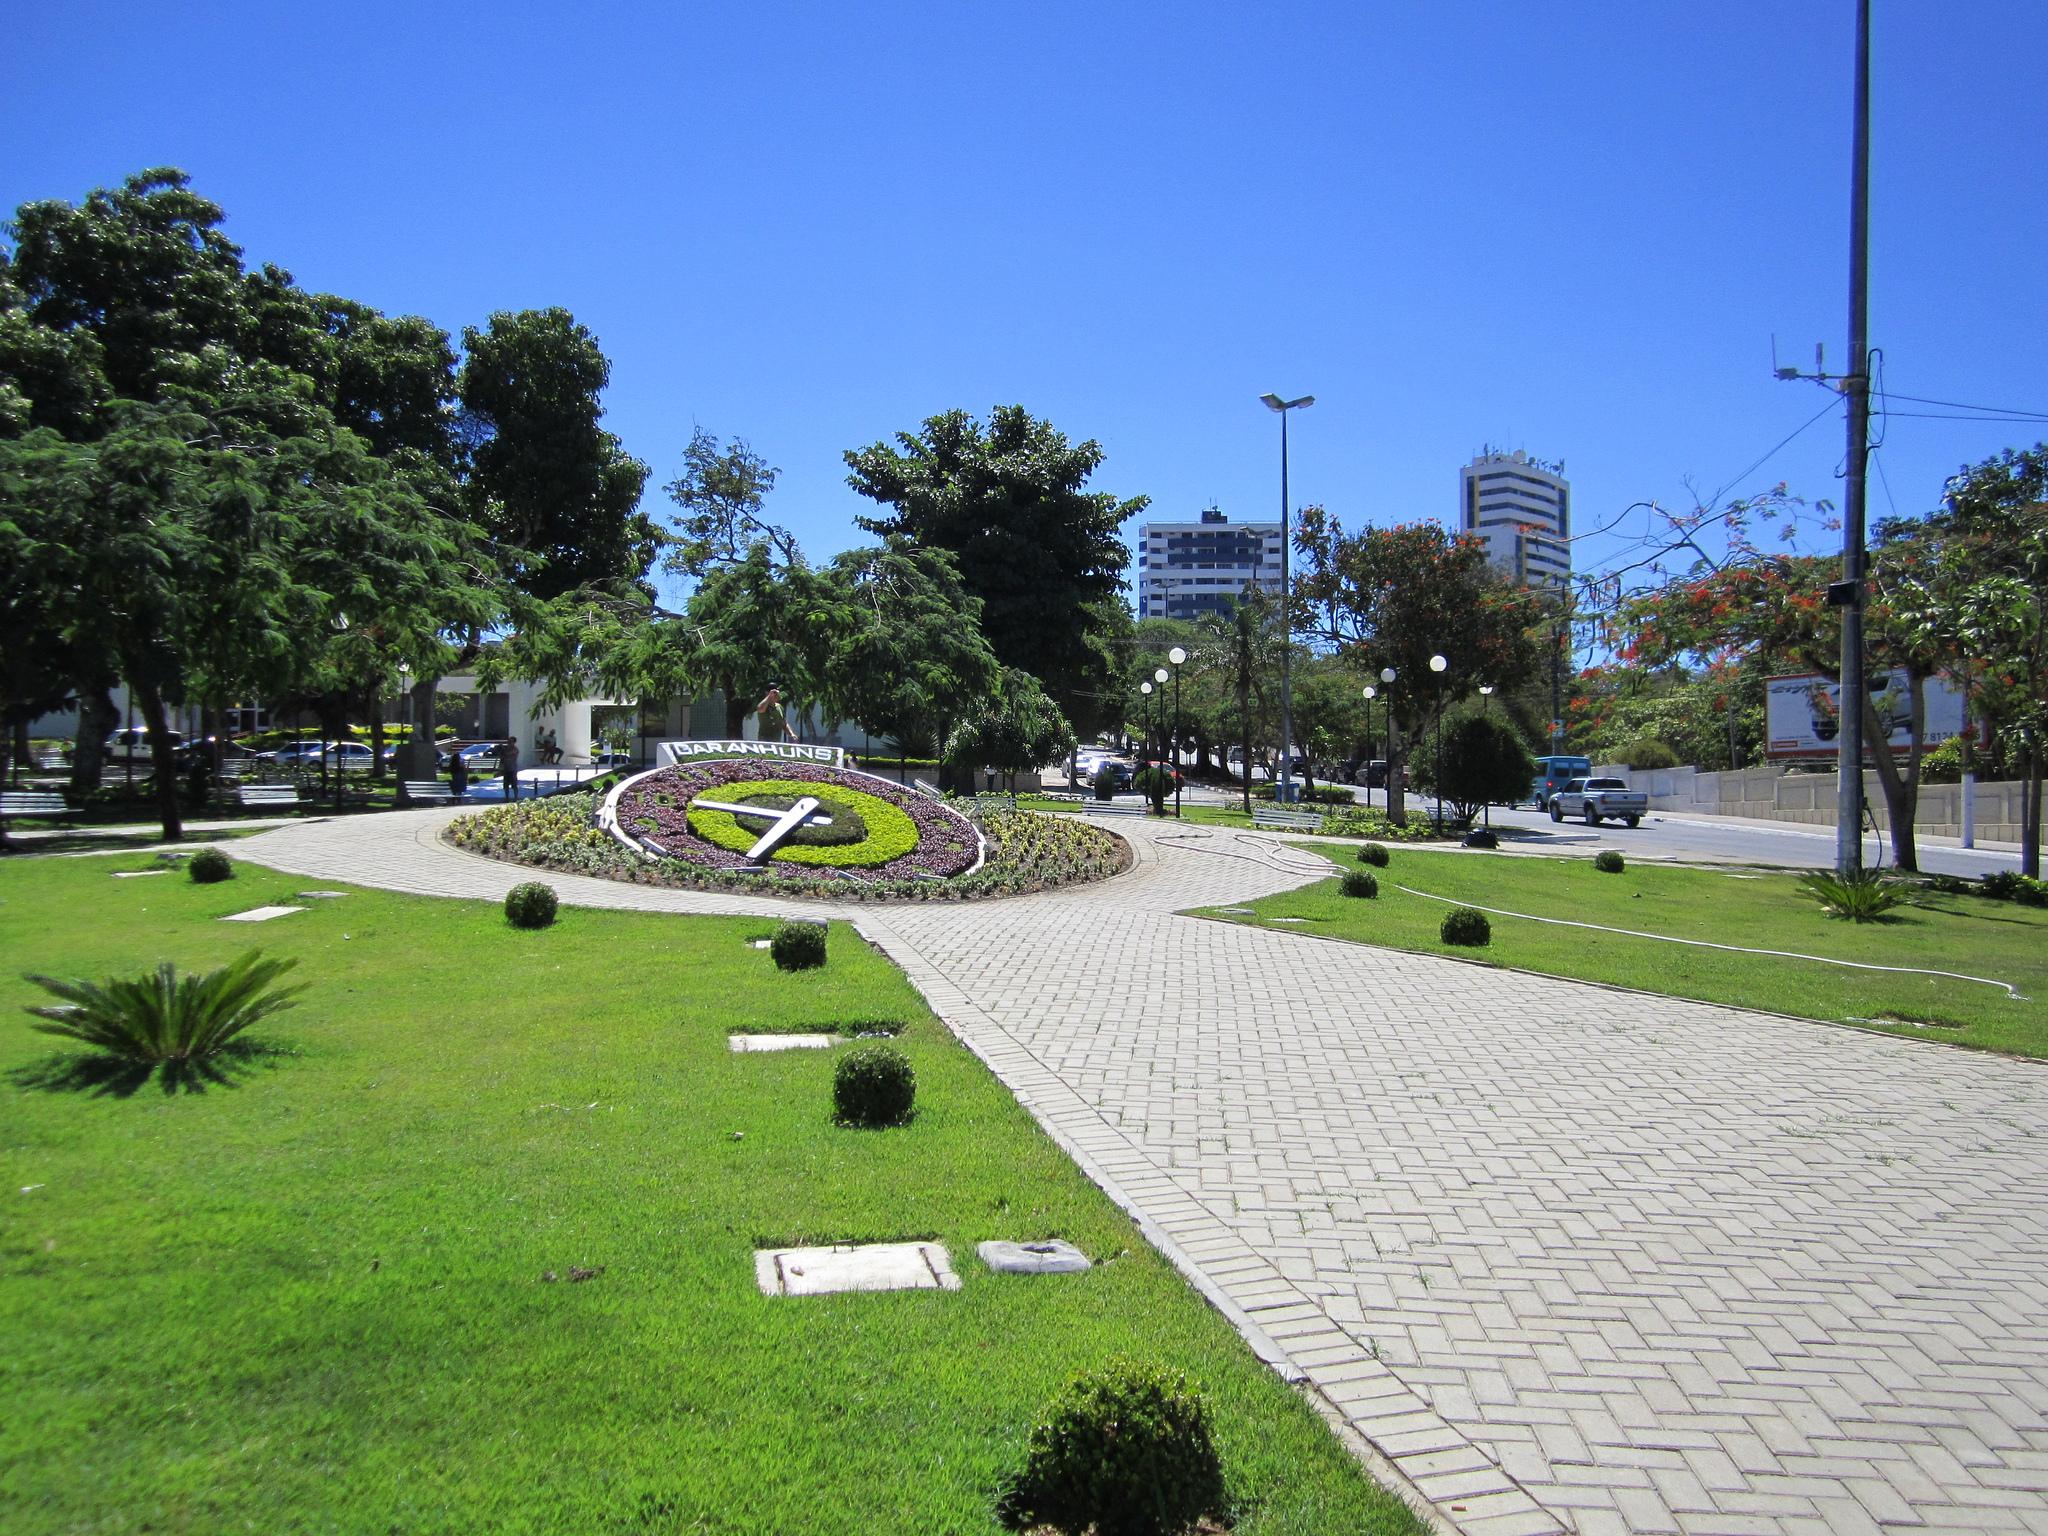 Brasil no inverno - Garanhuns PE